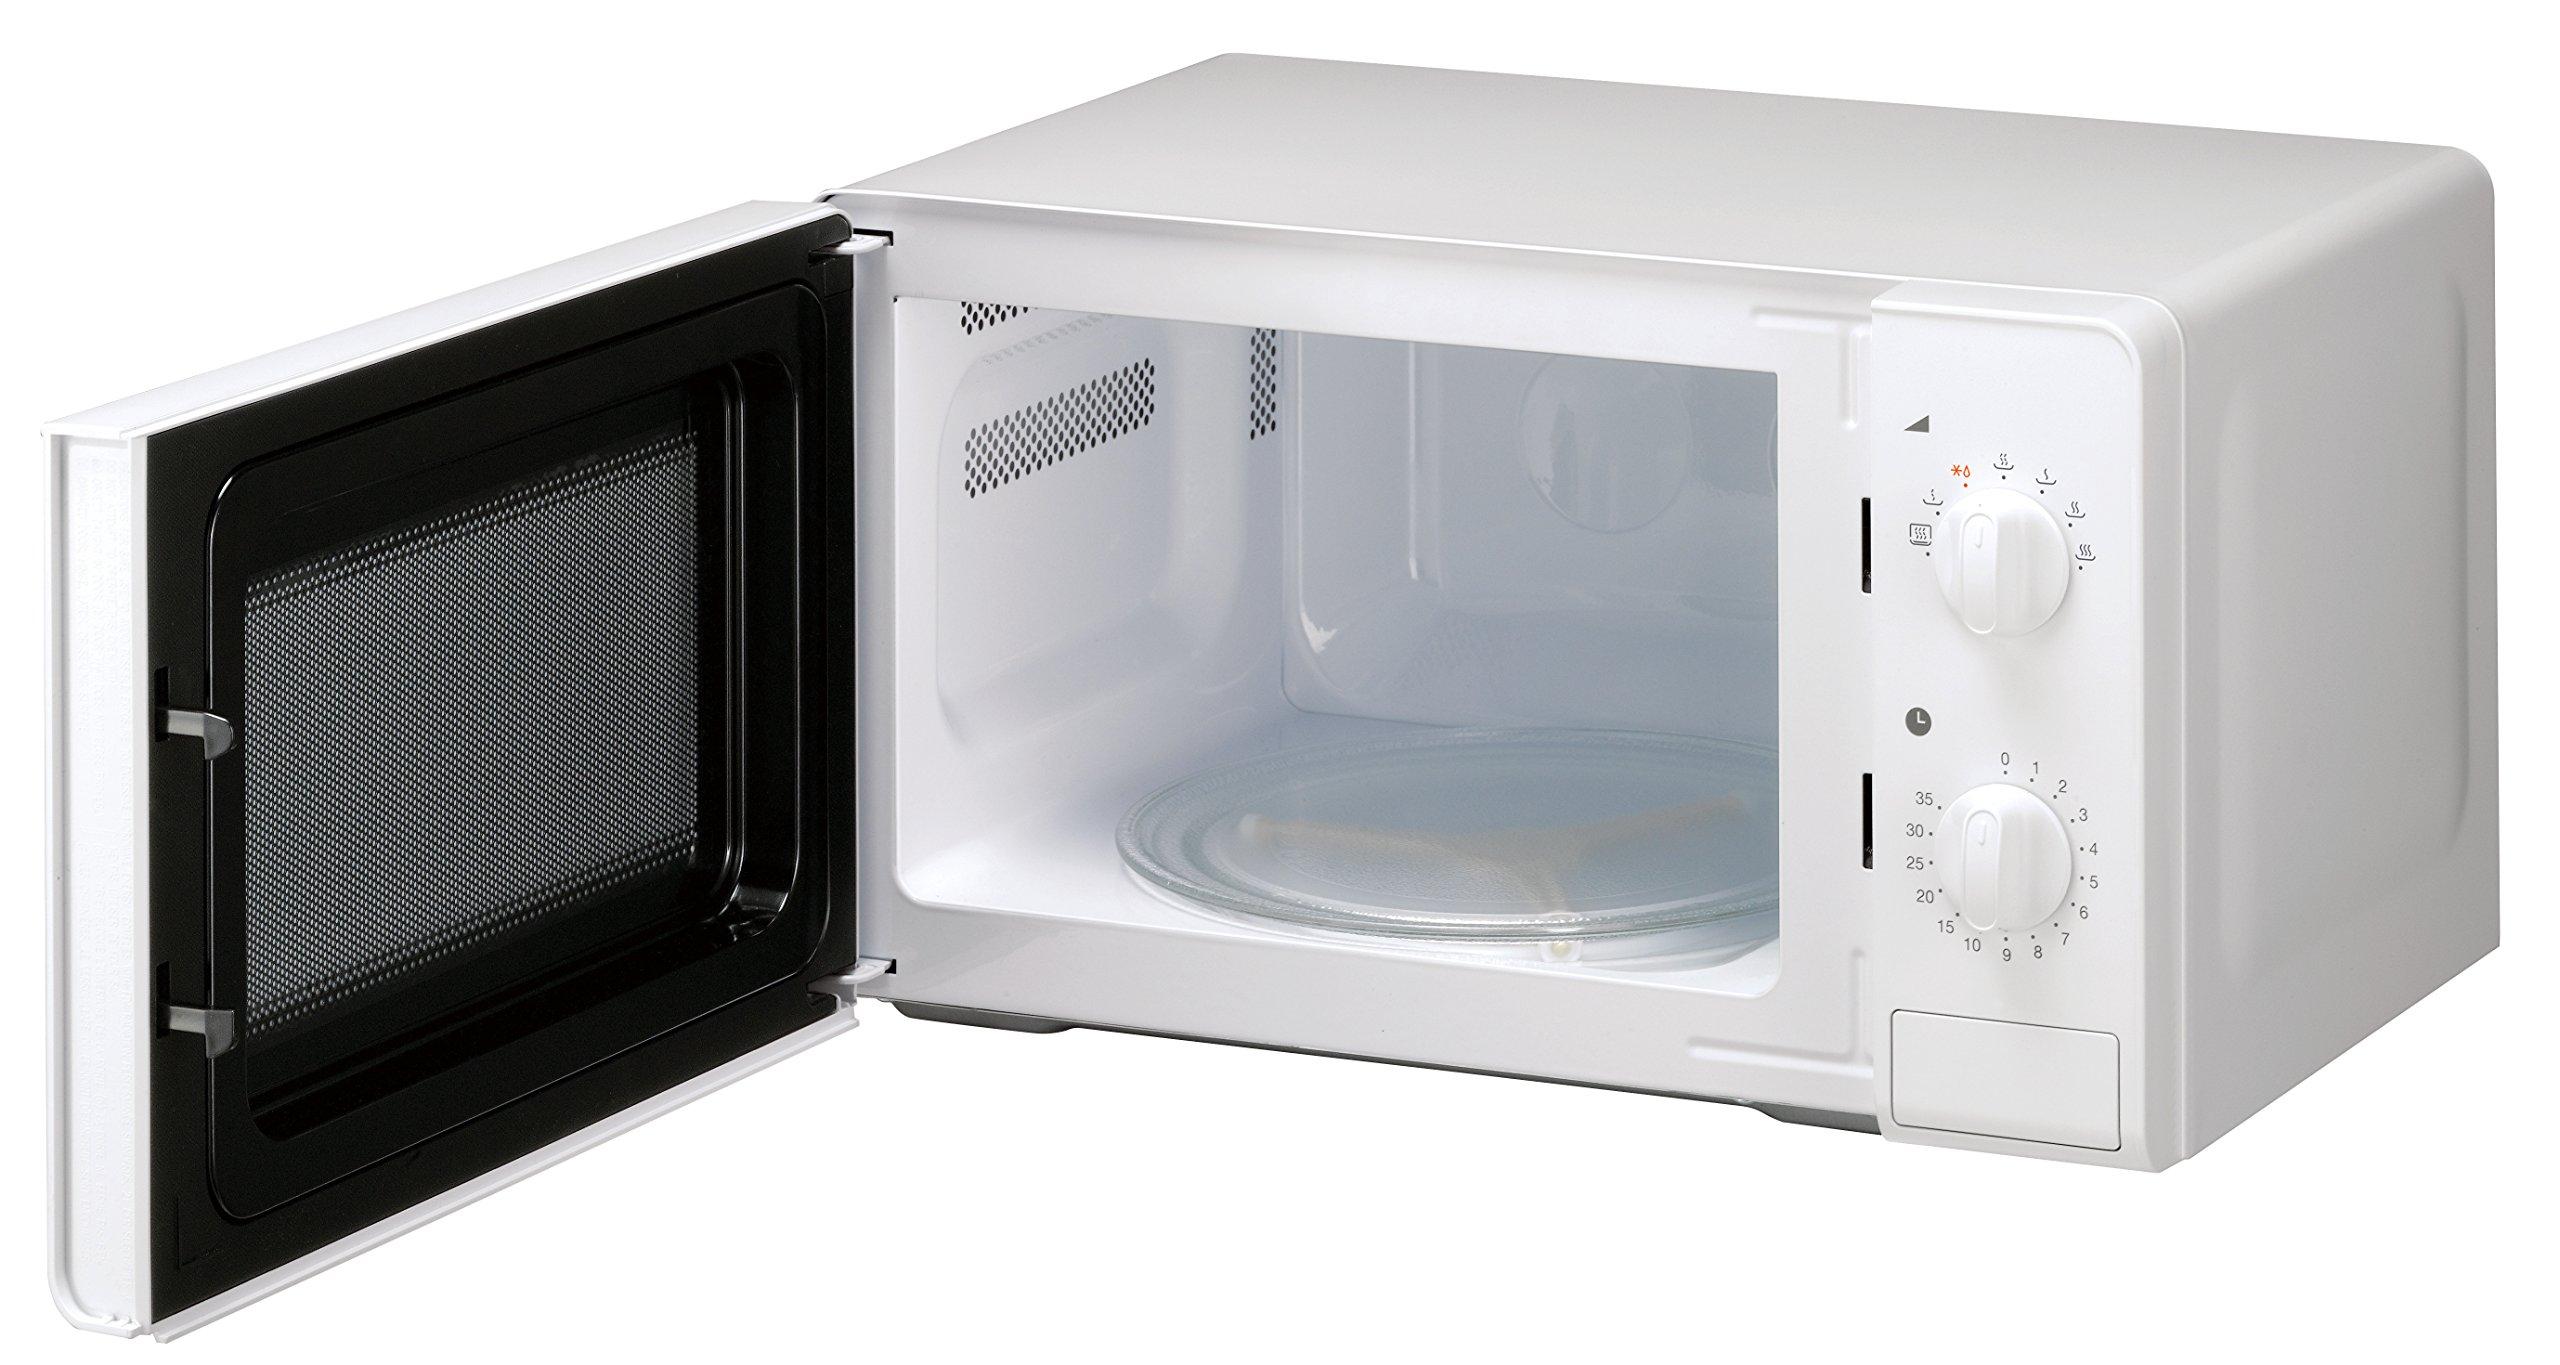 Daewoo Kor 6f07 Four Micro Ondes Manuel Sans Grill Blanc 20 L